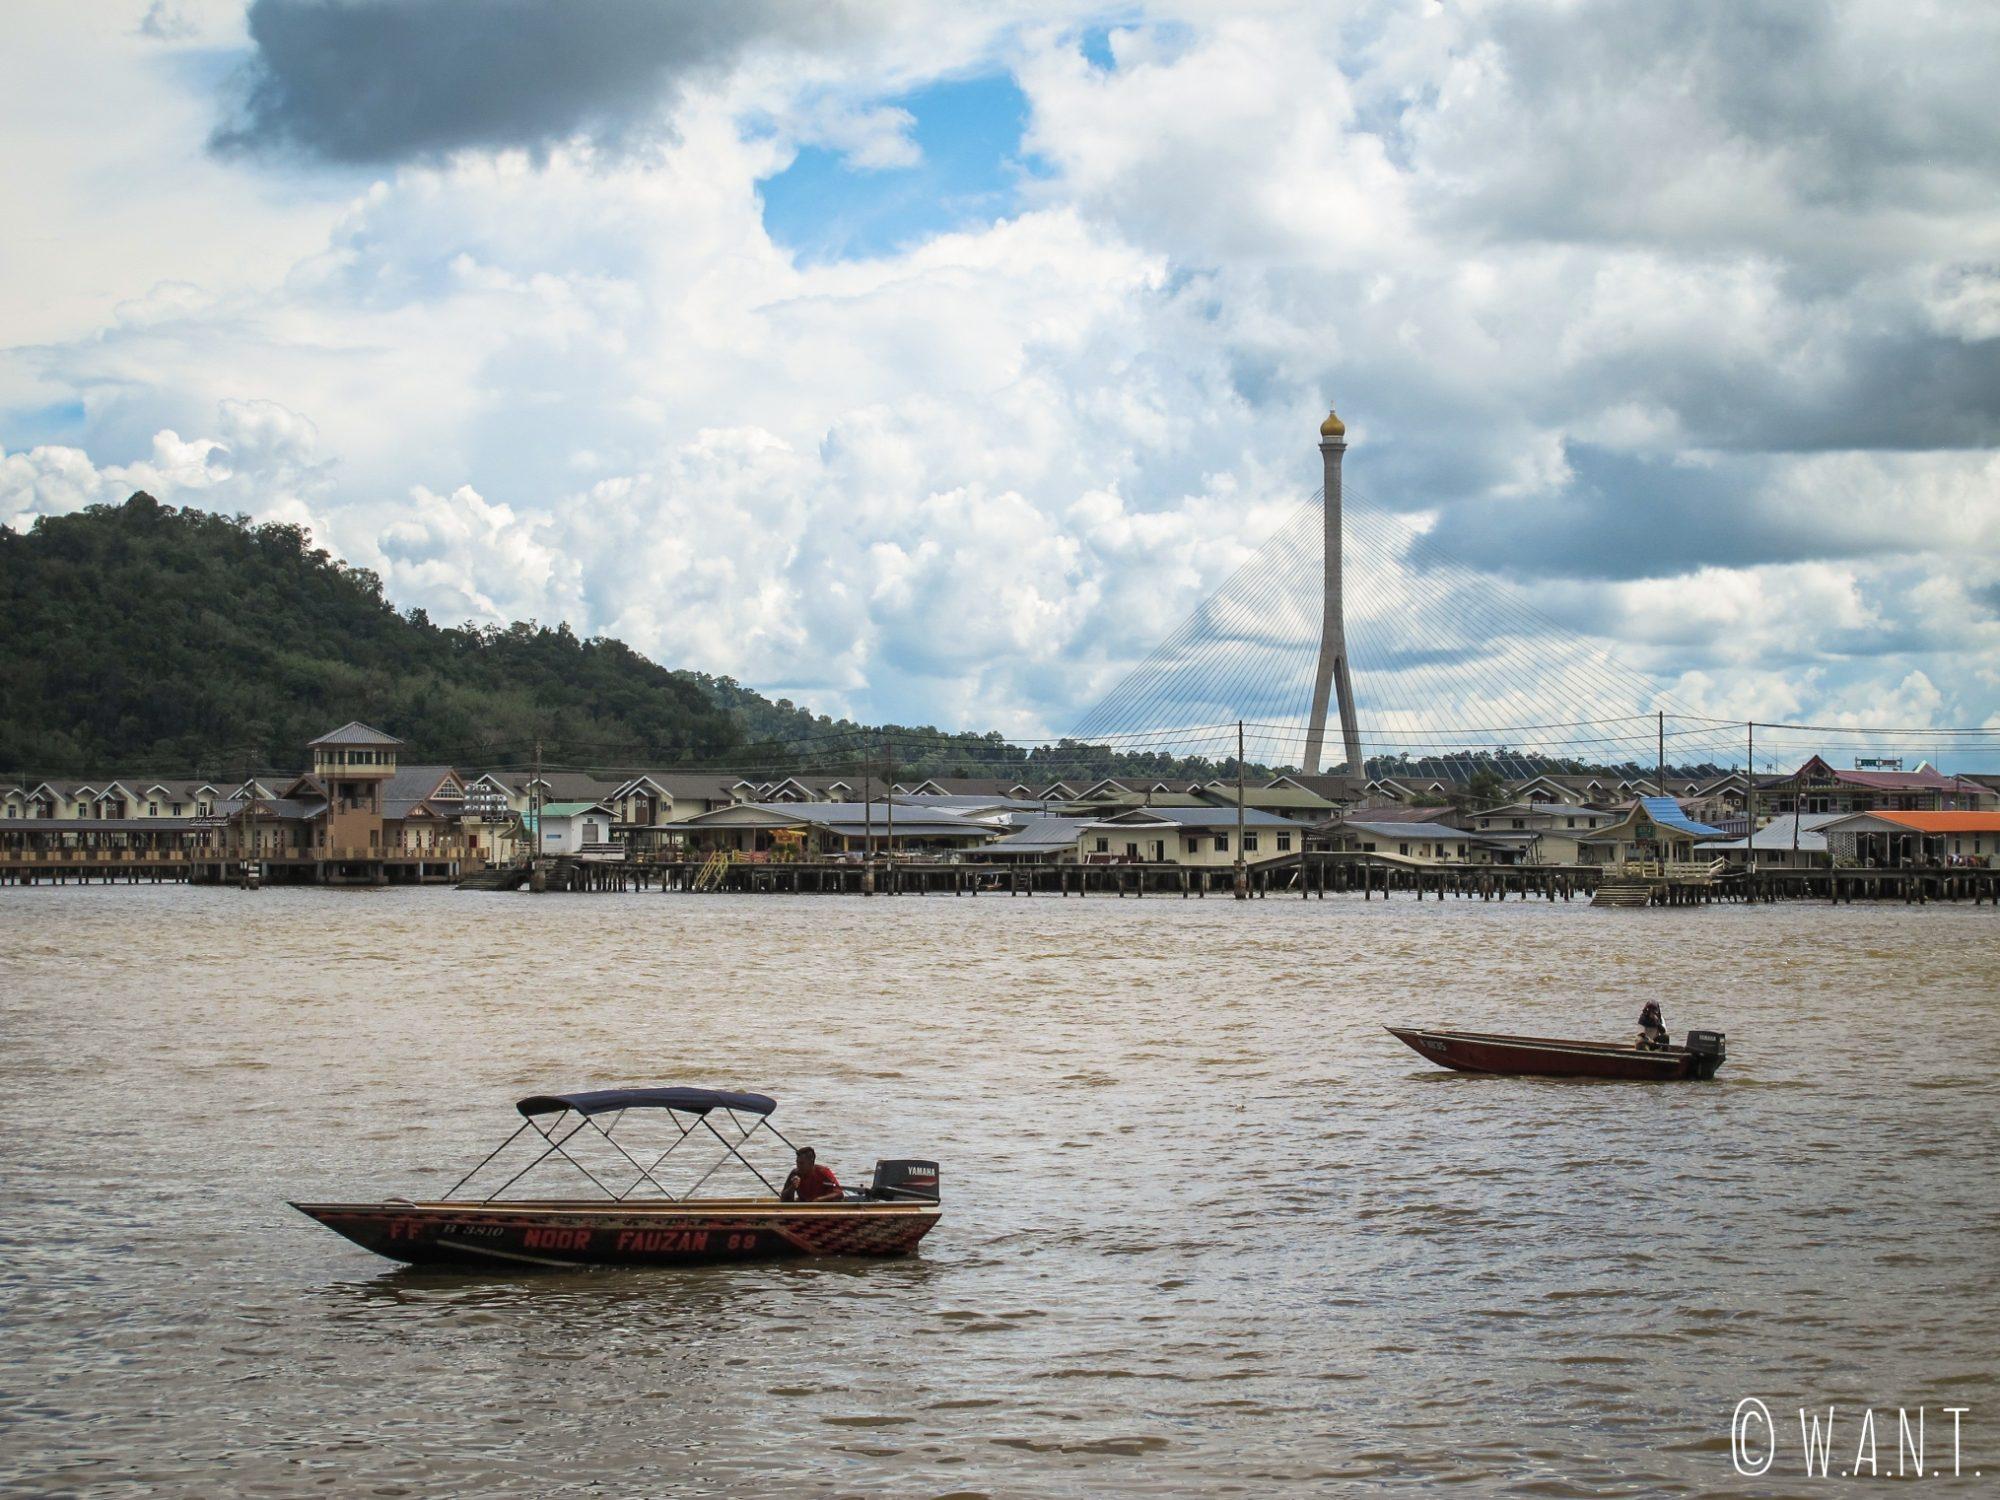 Vue sur le village flottant de Kampong Ayer à Bandar Seri Begawan